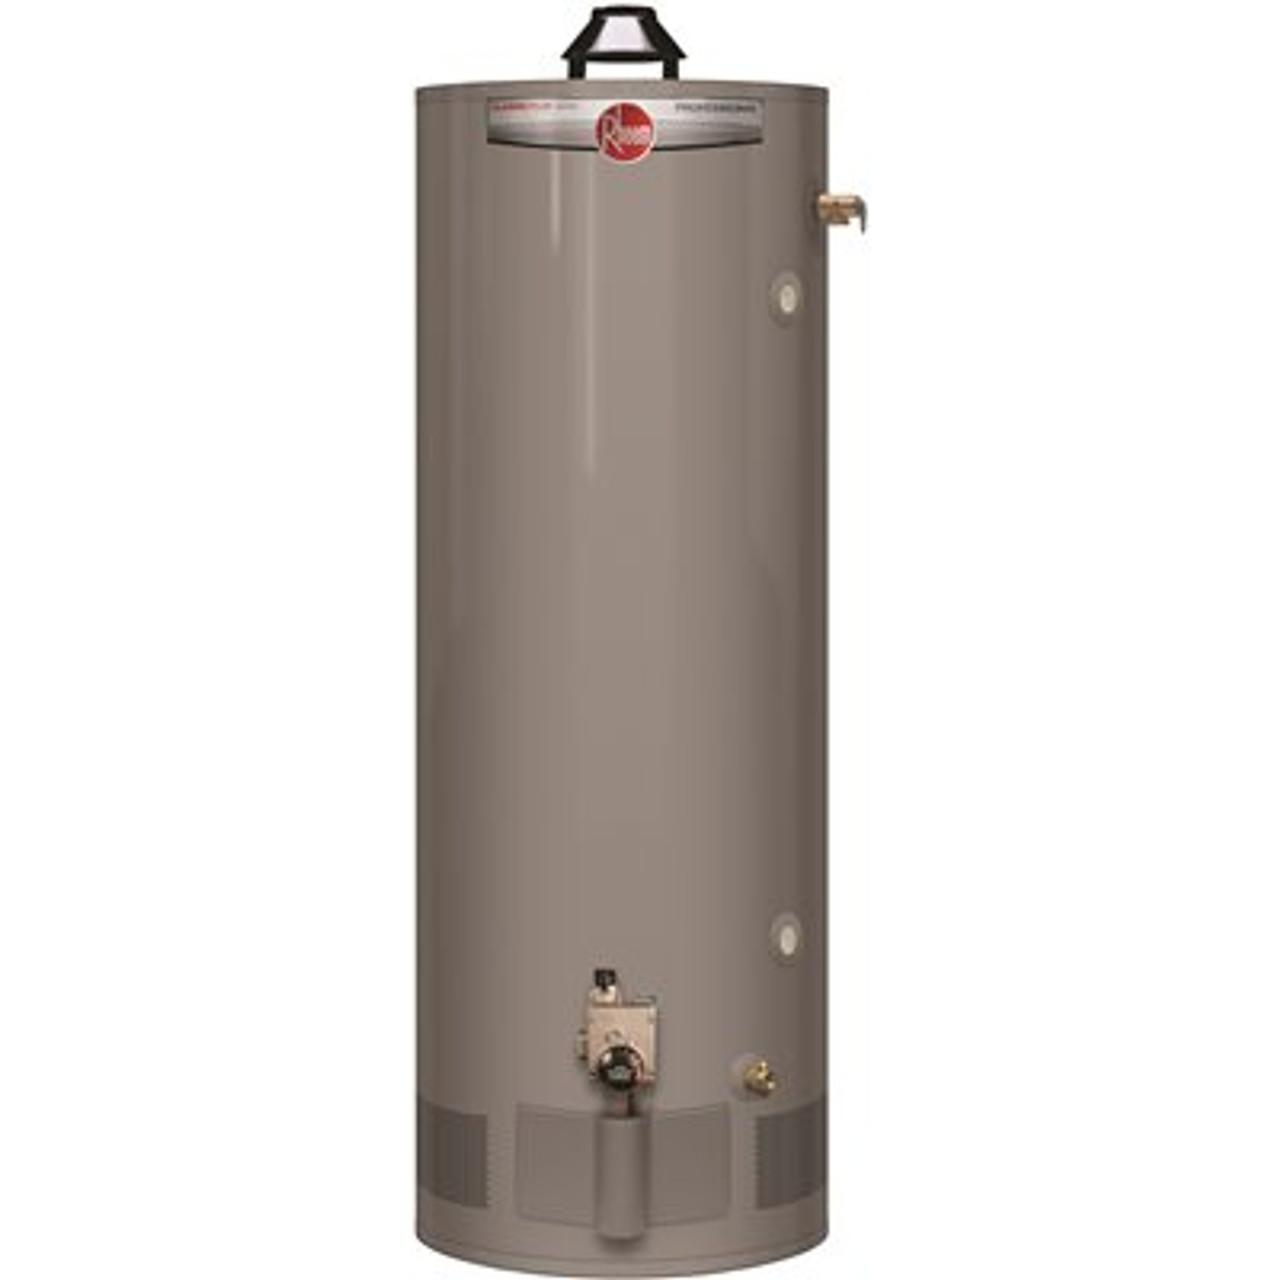 Rheem Pro-Classic Plus 50 gal. Tall 8-Year Warranty Residential Natural Gas Water Heater - Item # 3576806, Rheem Part # PRO+G50-40N RH62, UPC Code 020352630588